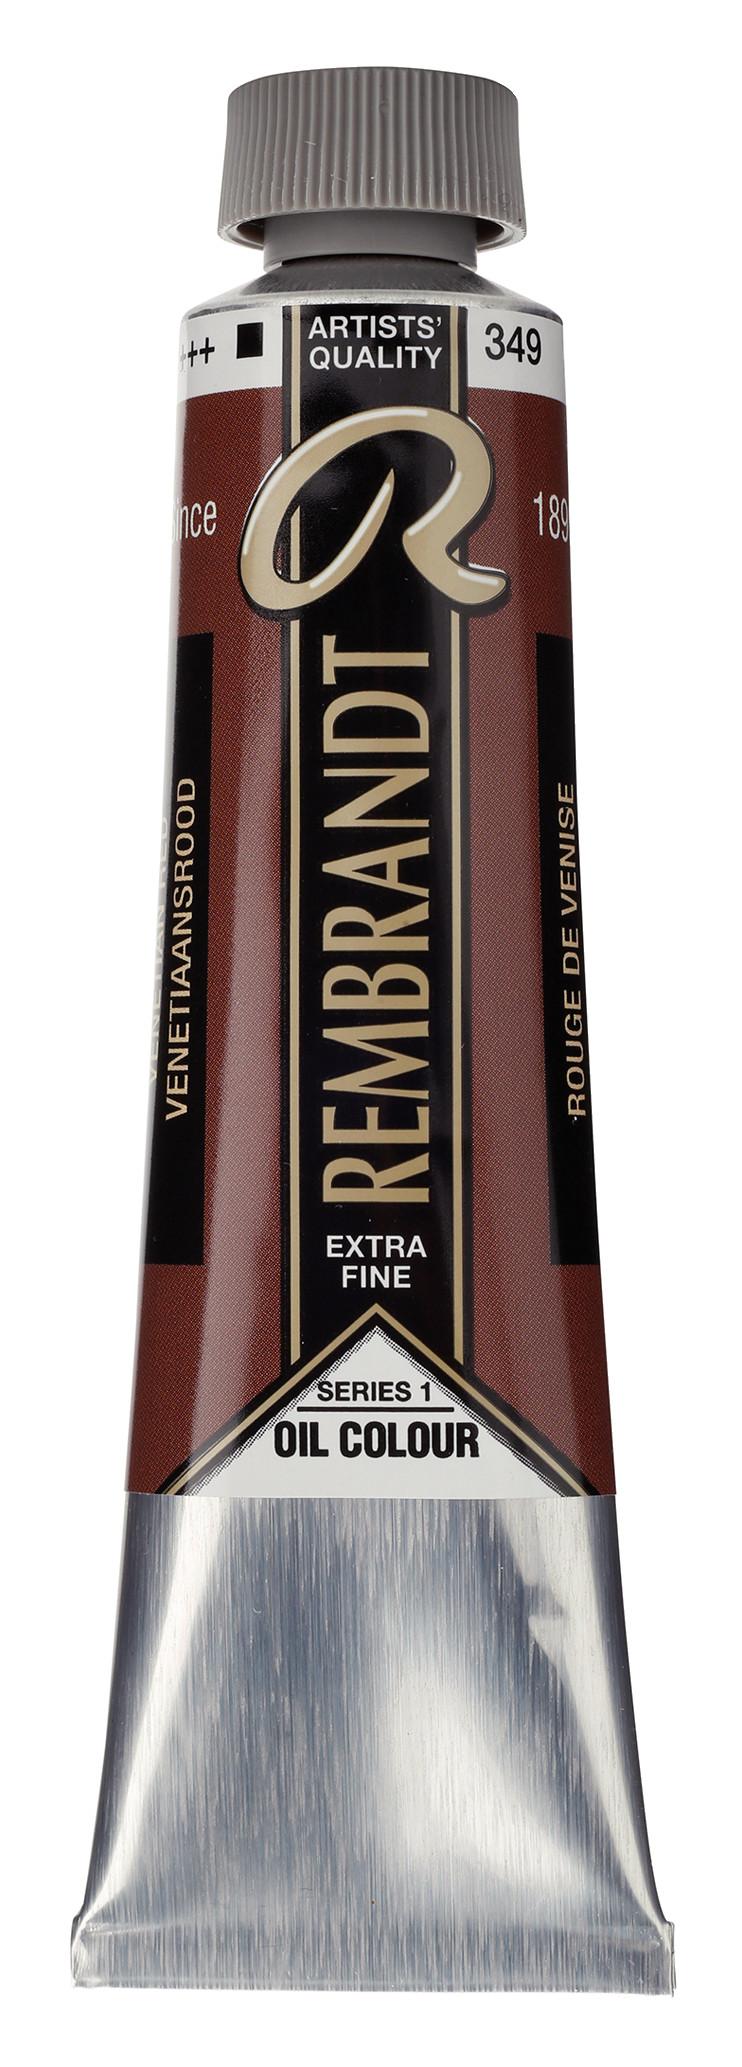 Rembrandt Oil colour Paint Venetian Red (349) 40ml Tube